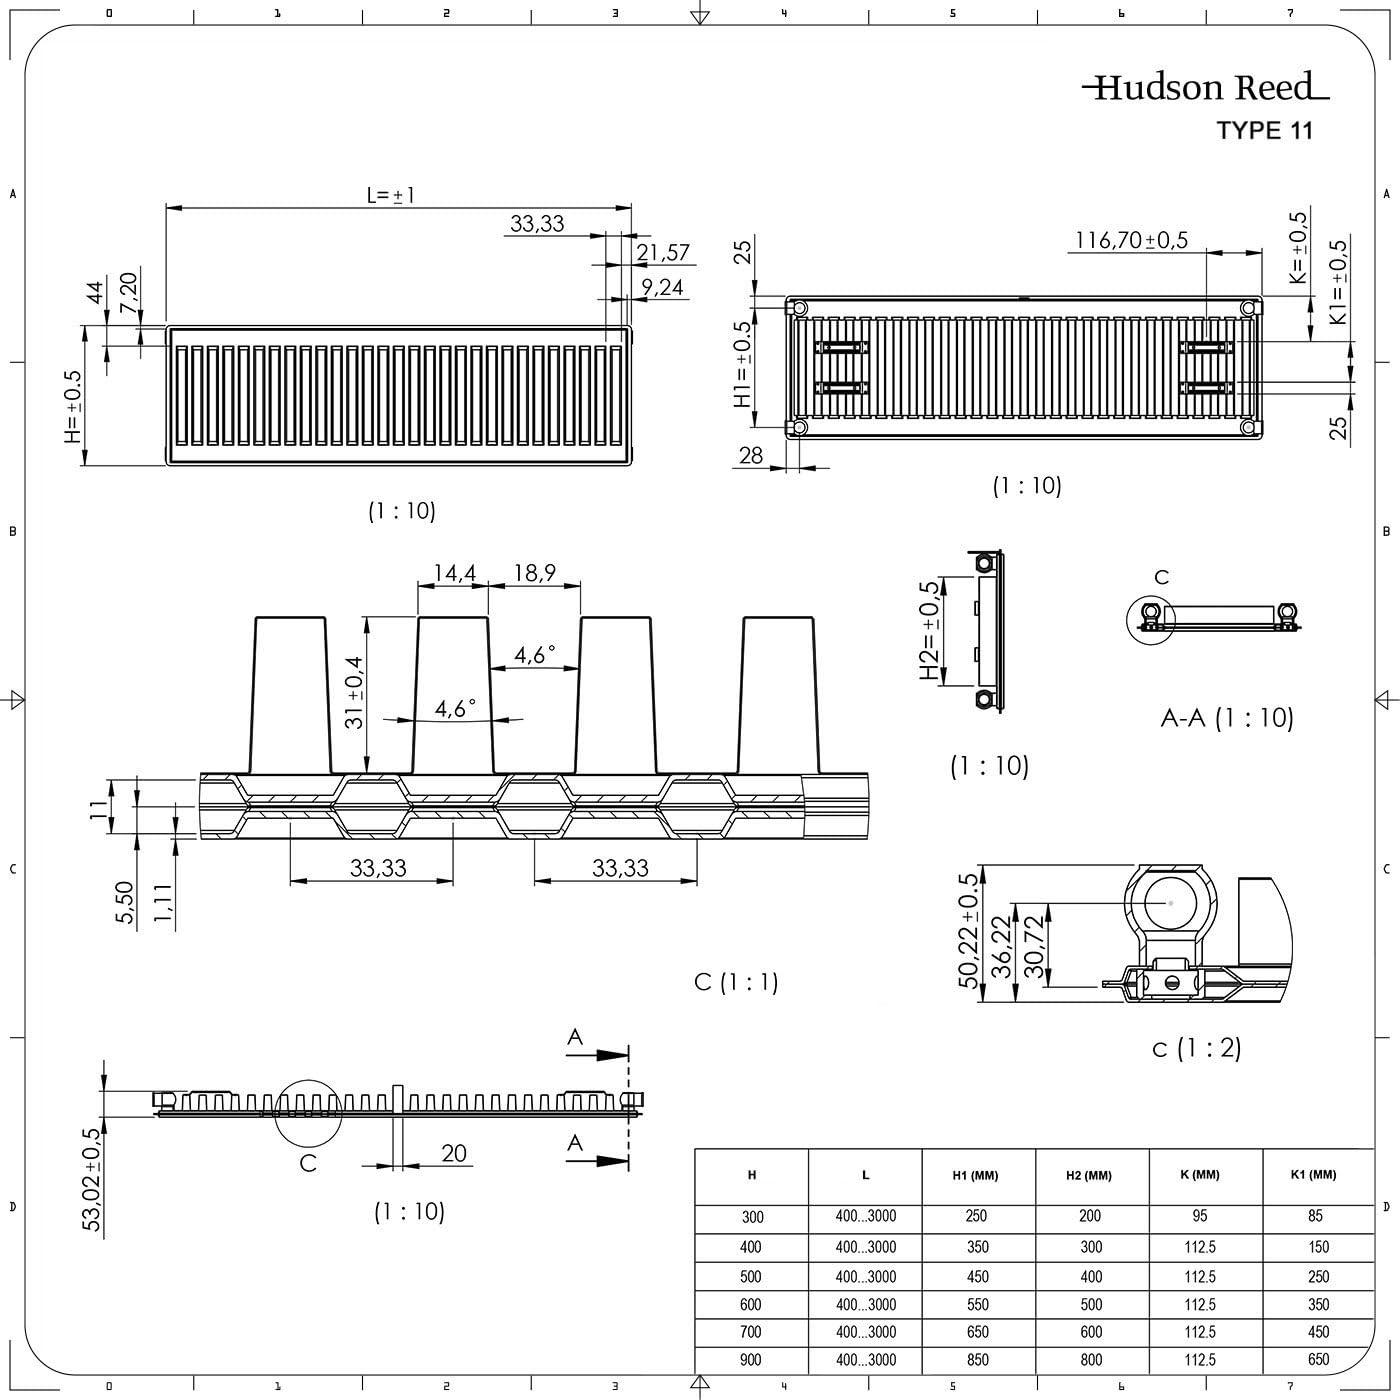 Type 11 Hudson Reed Eco Radiateur Horizontal /À Panneaux 30 x 40cm Blanc